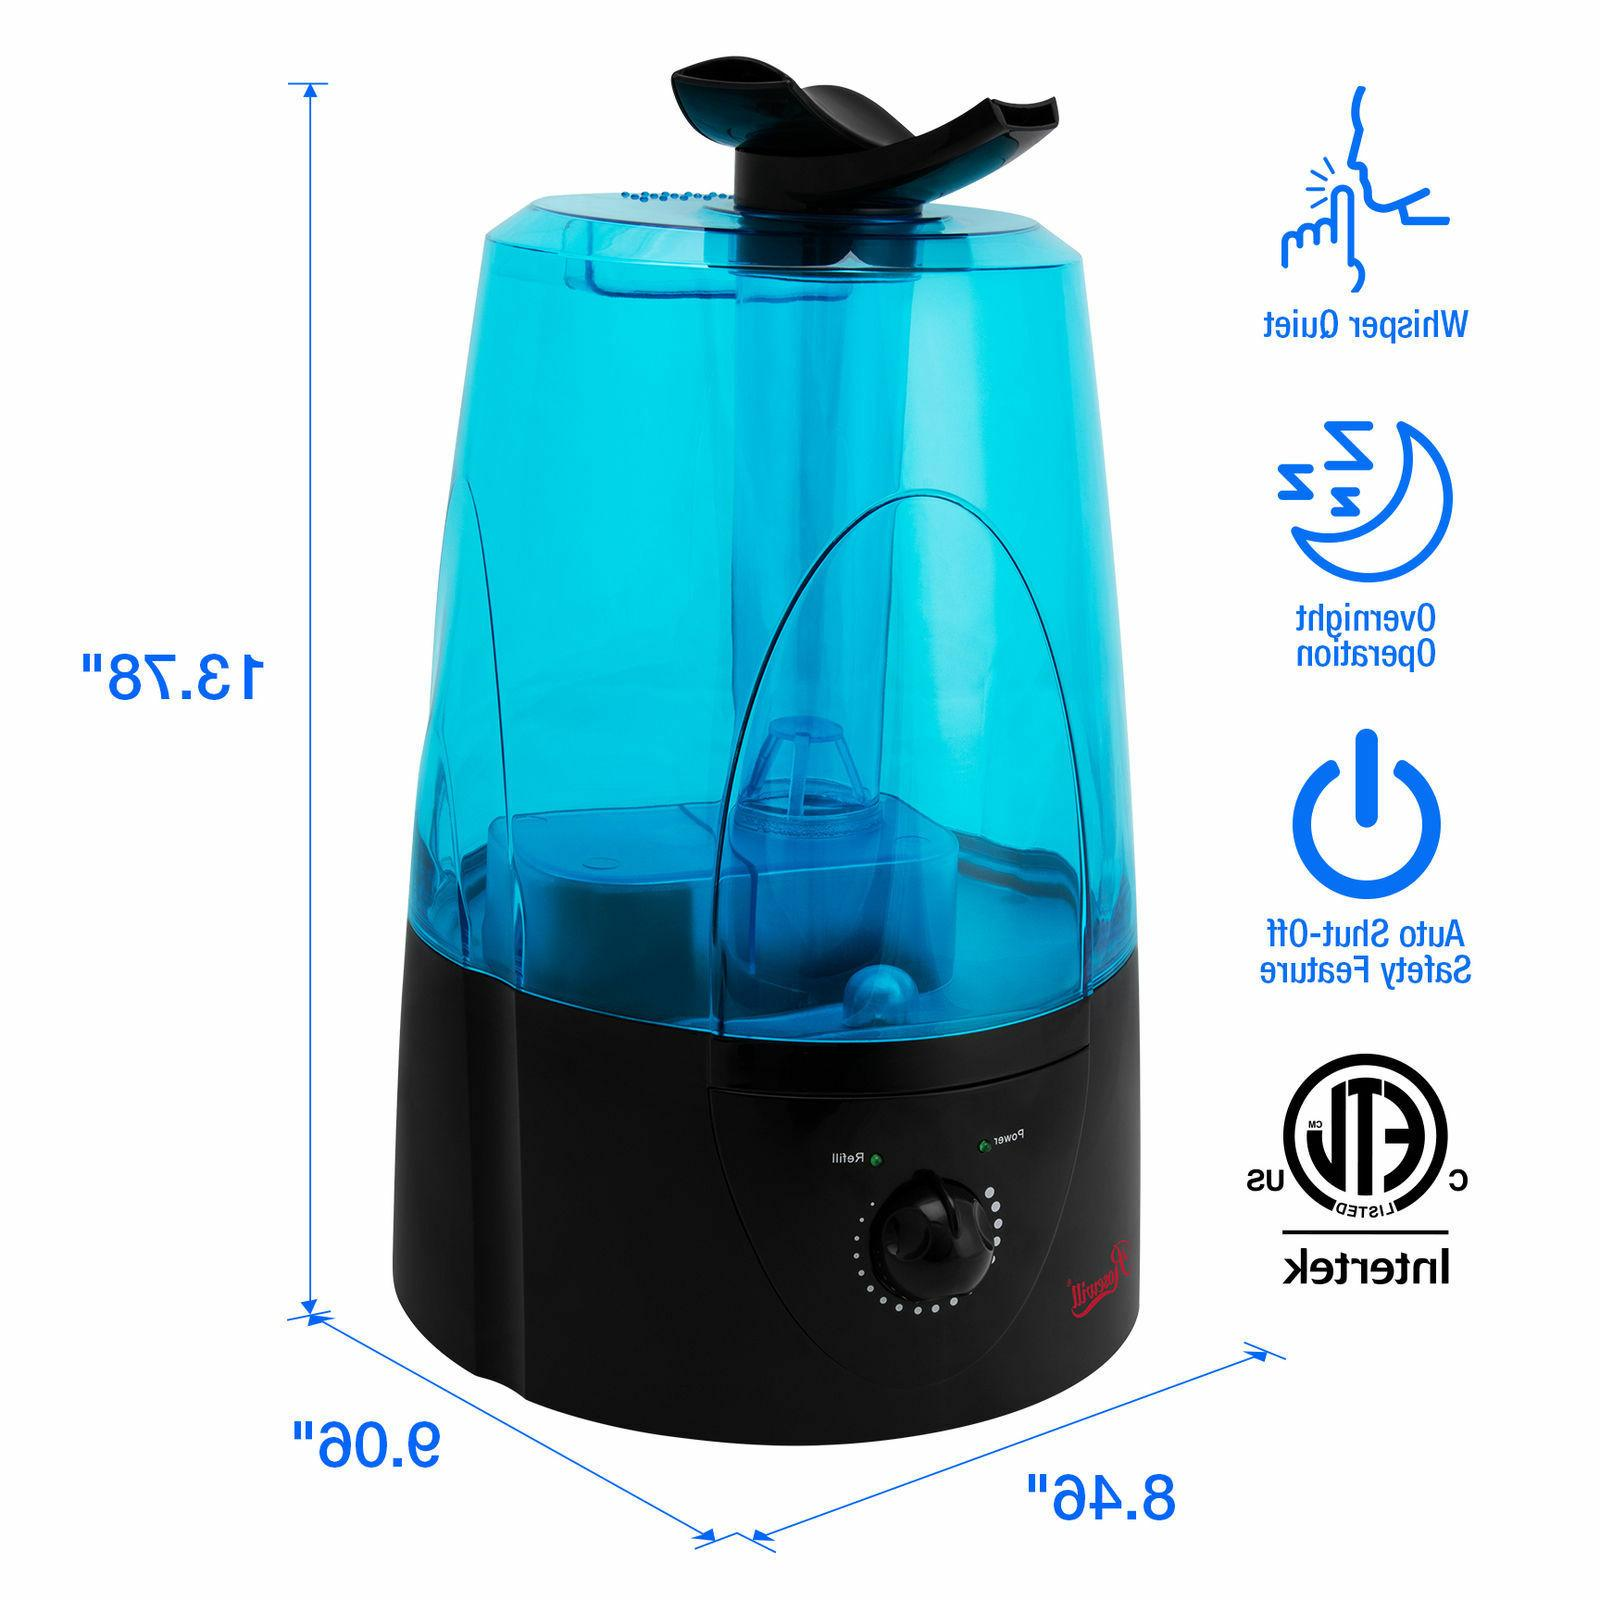 Ultrasonic Cool Dual Mist Humidifier, quiet, filter free, au